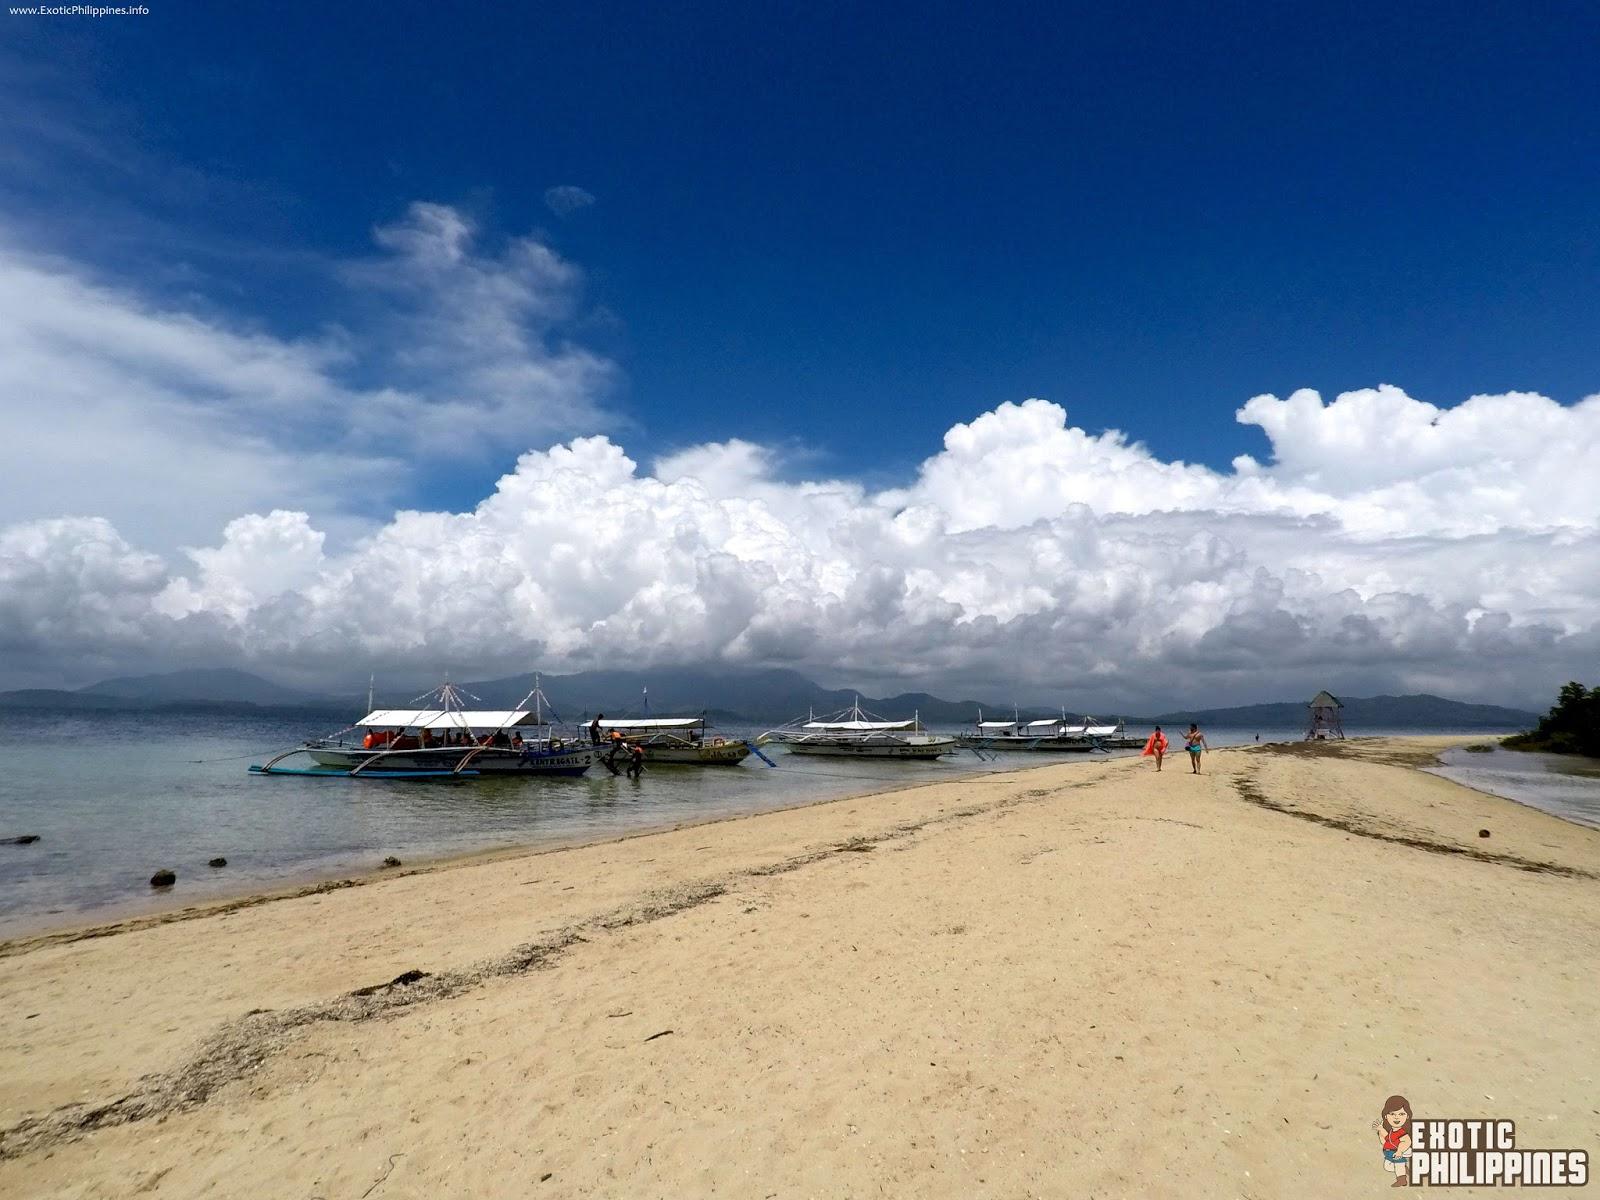 Lunch Stop at Starfish Island Honday Bay Puerto Princesa Palawan Philippines Travel Blog Blogger G Dumaguing Vlogger